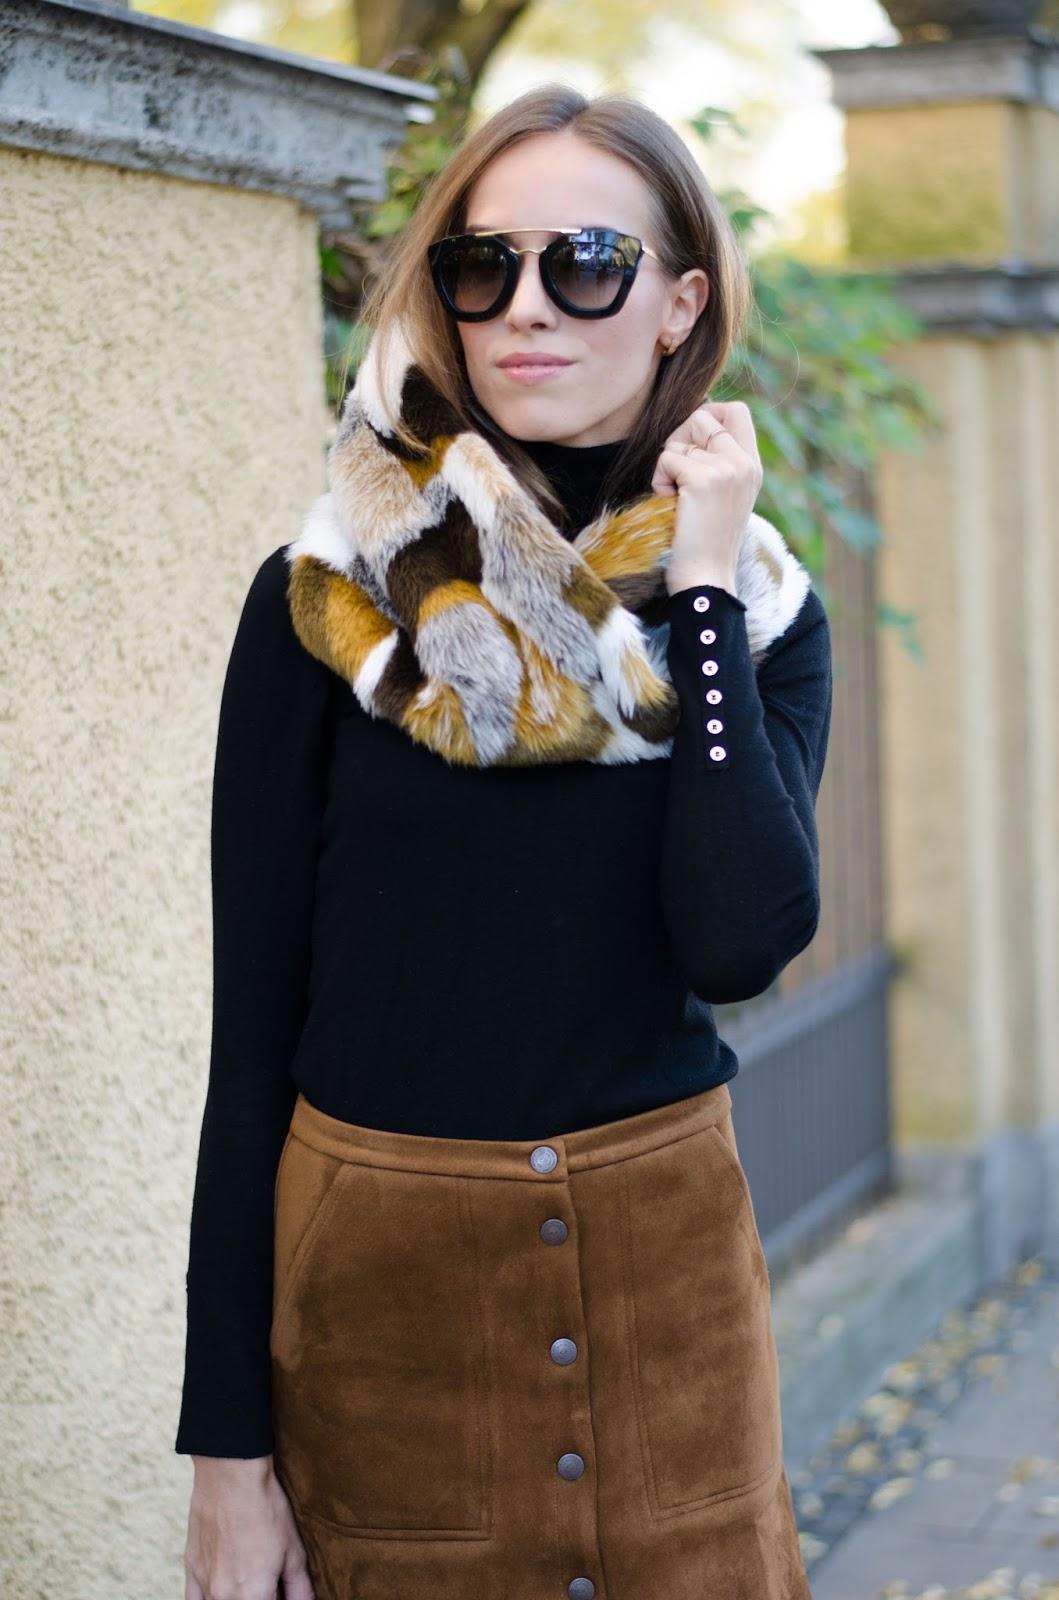 kristjaana mere prada cat eye sunglasses faux fur collar black pullover fall outfit